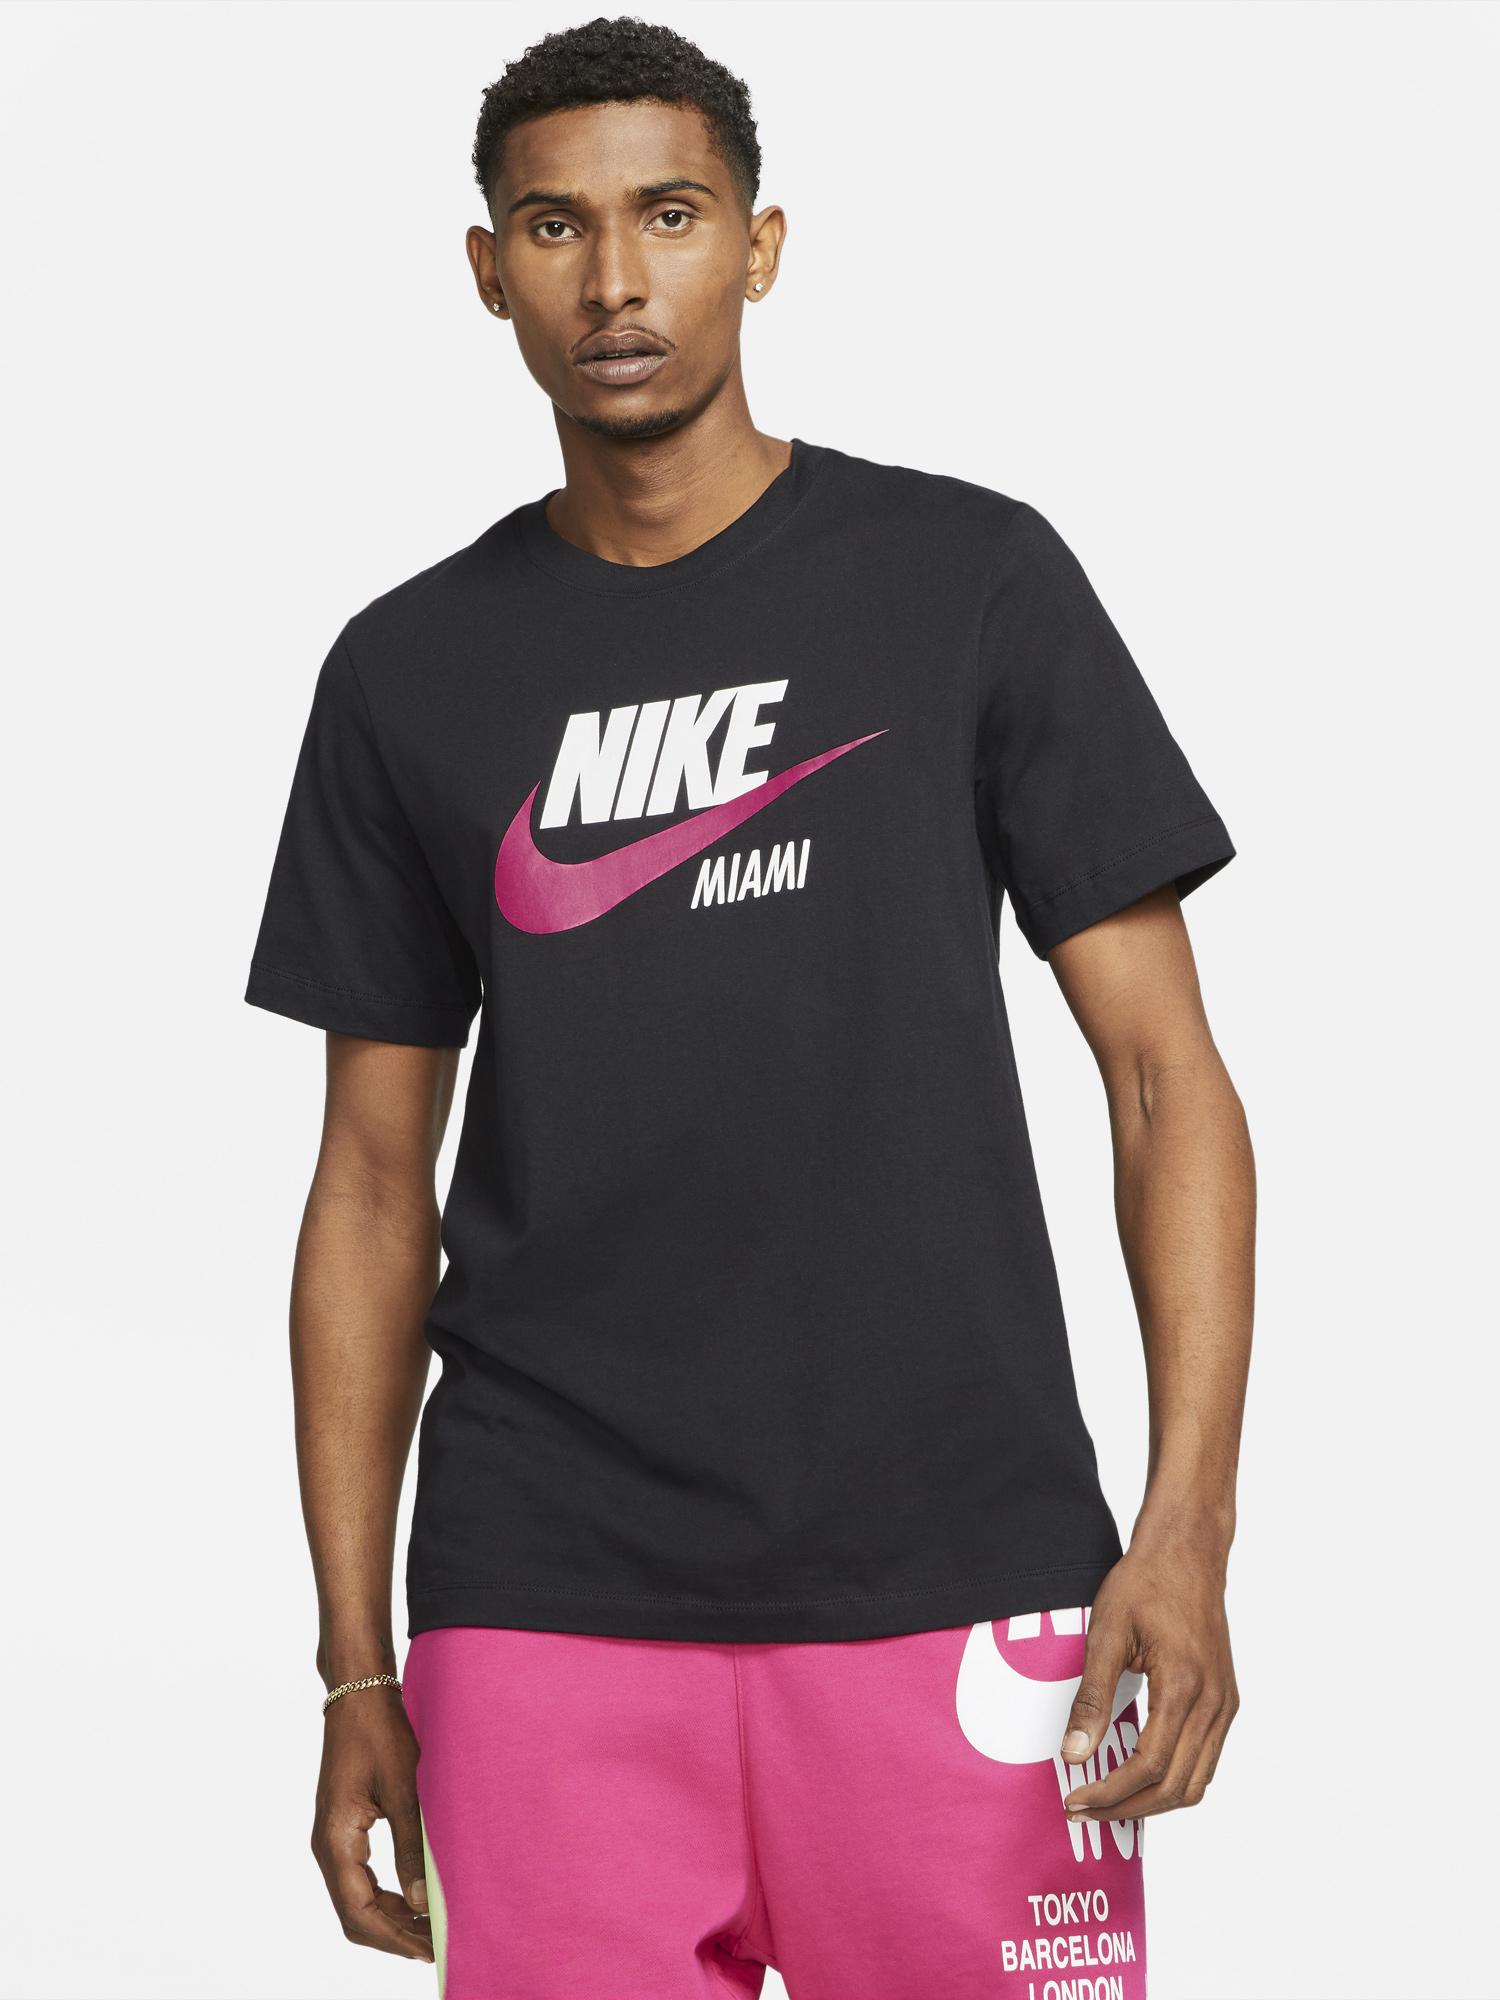 nike-miami-south-beach-t-shirt-black